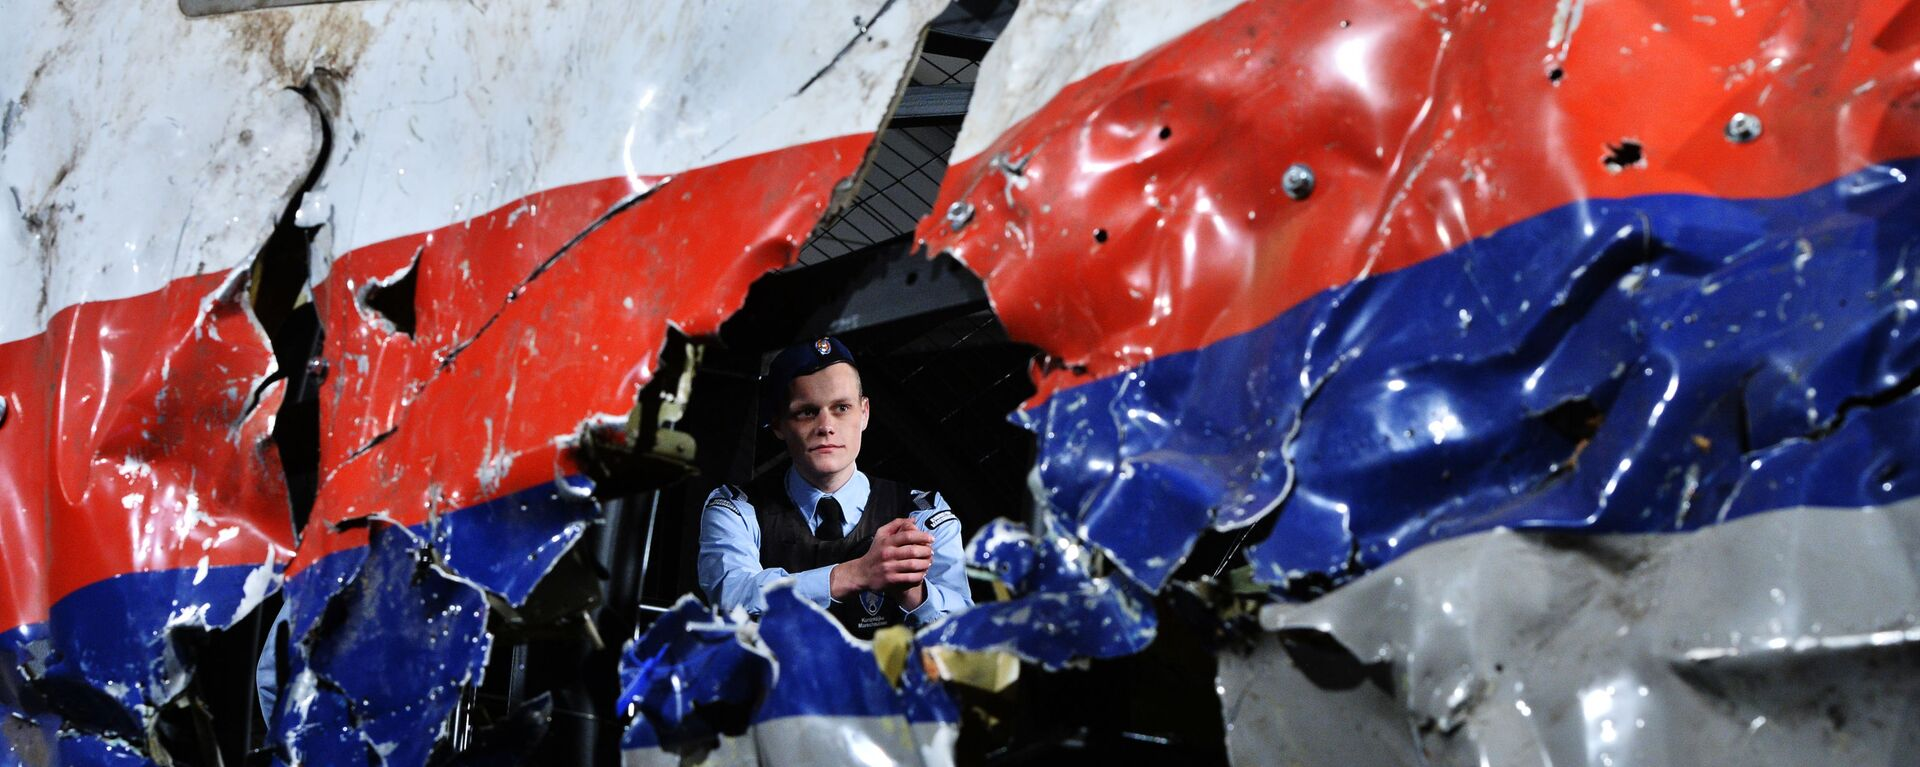 Rekonstrukce pádu Boeing 777 Malaysia Airlines (let MH17)  - Sputnik Česká republika, 1920, 25.06.2021